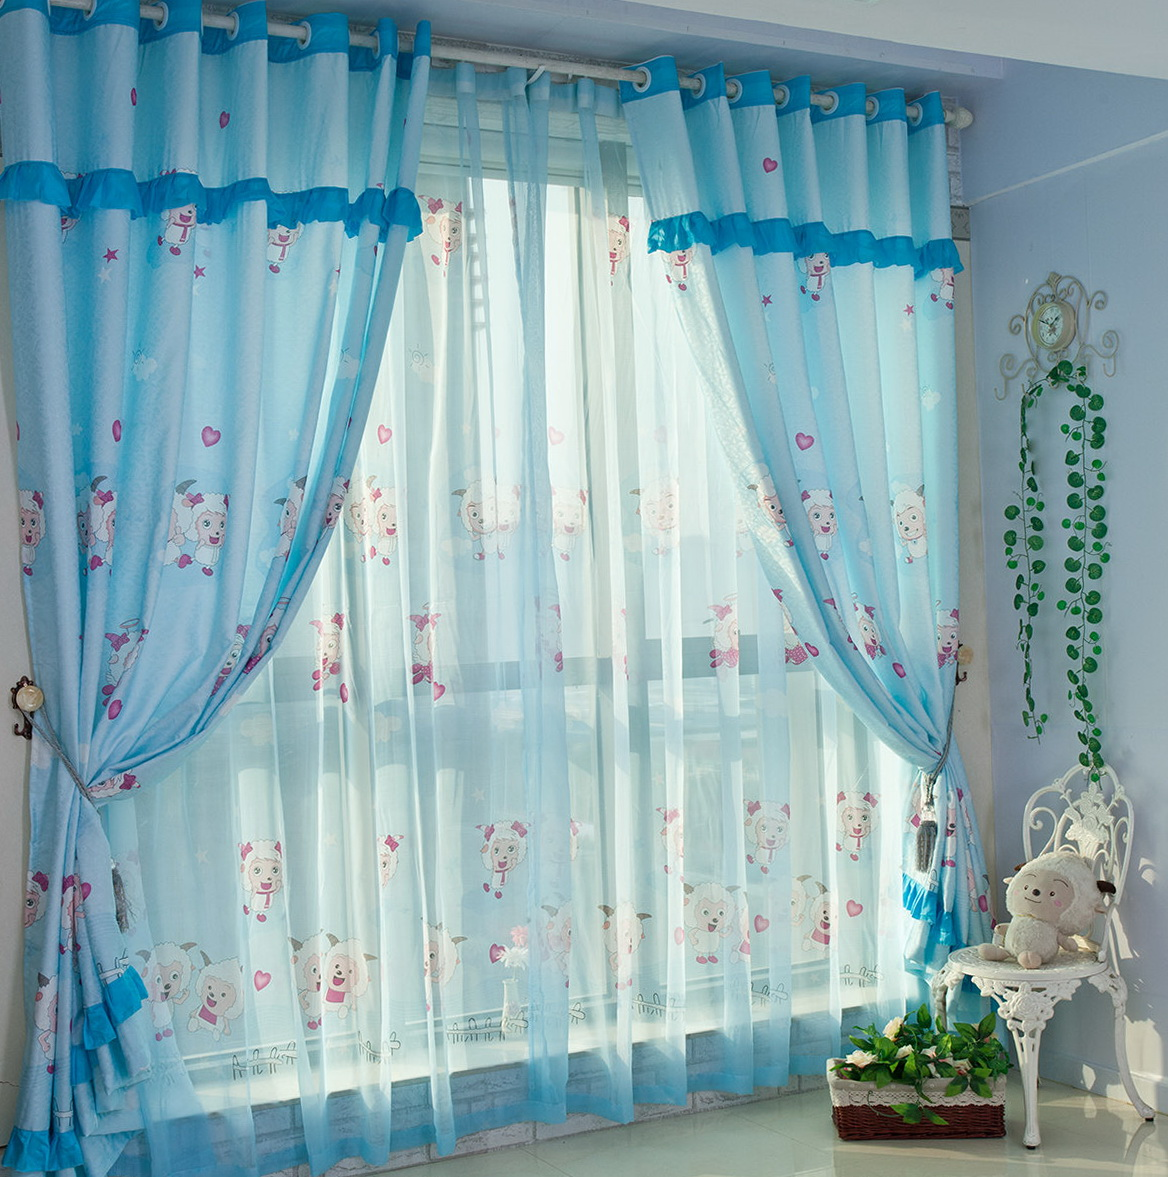 Blackout Curtains For Kids Bedroom